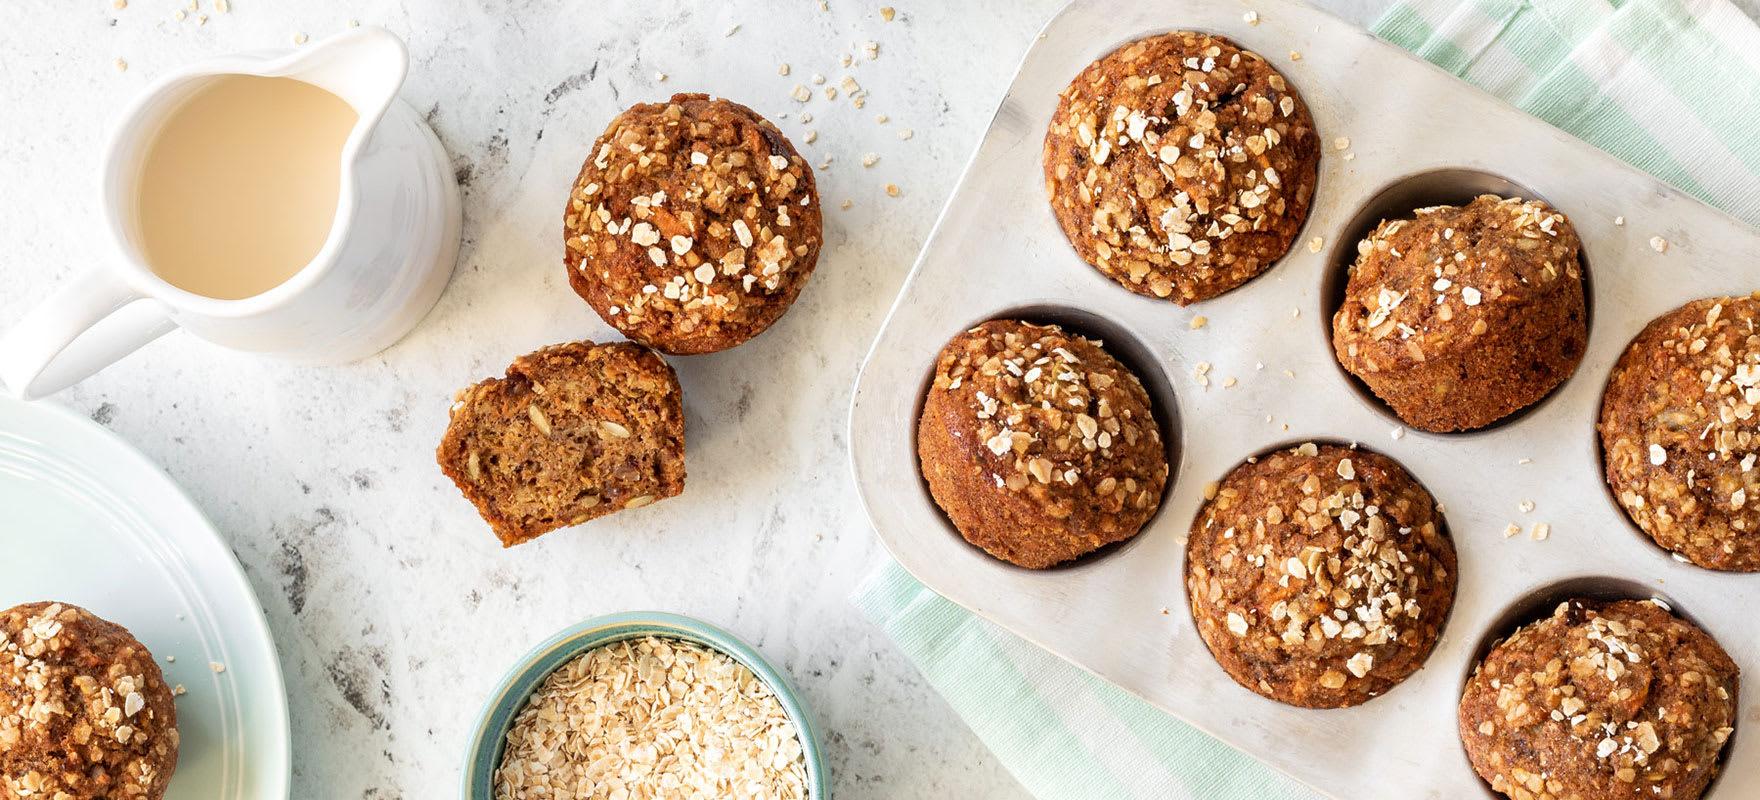 Breakfast muffins image 1